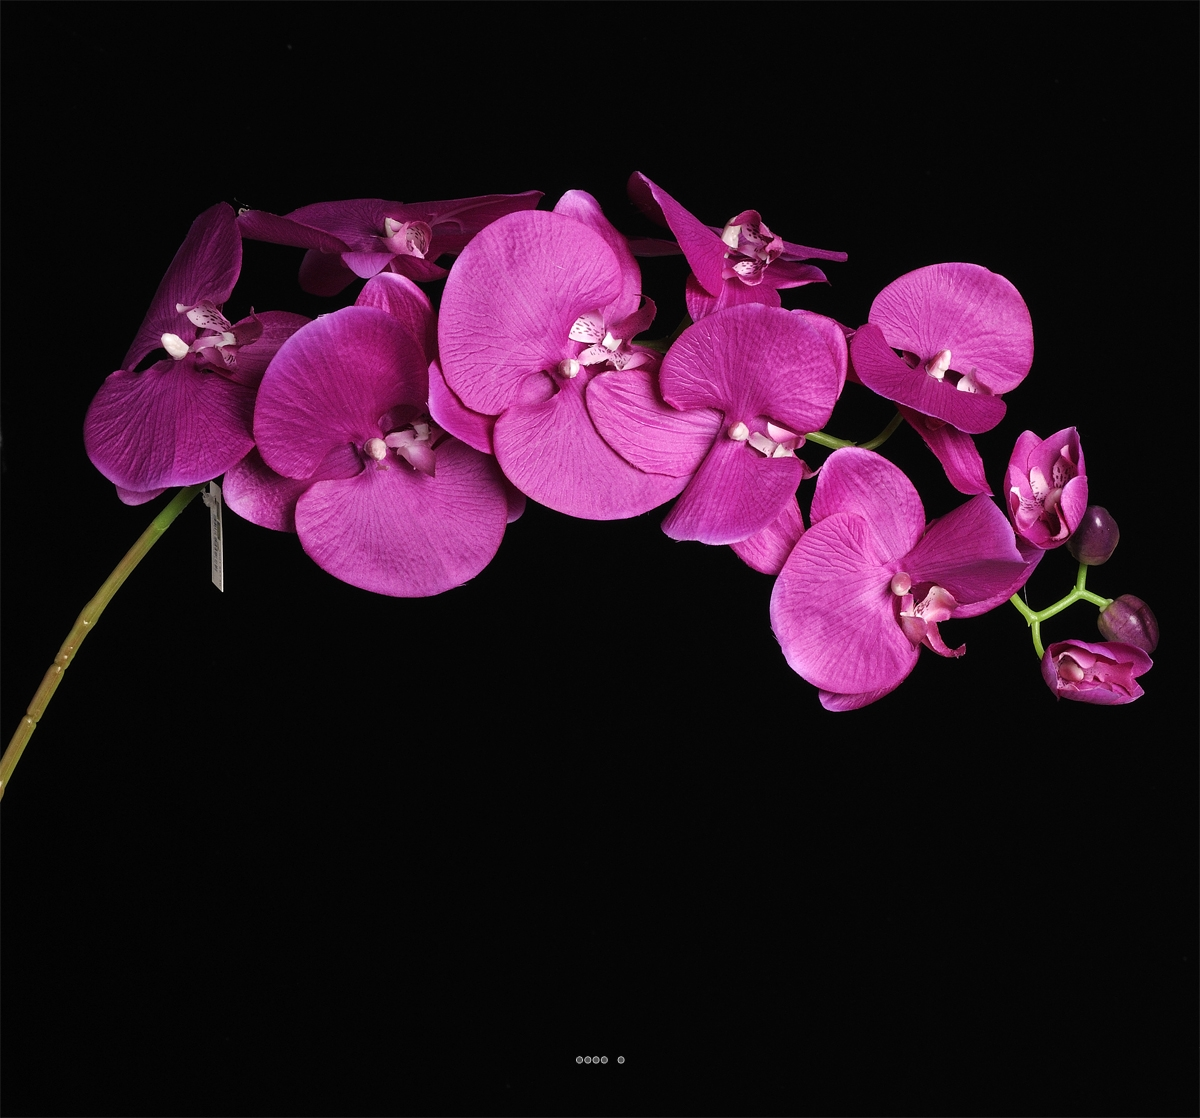 orchidee lisa artificielle h 98 cm 8 fleurons 4 boutons. Black Bedroom Furniture Sets. Home Design Ideas